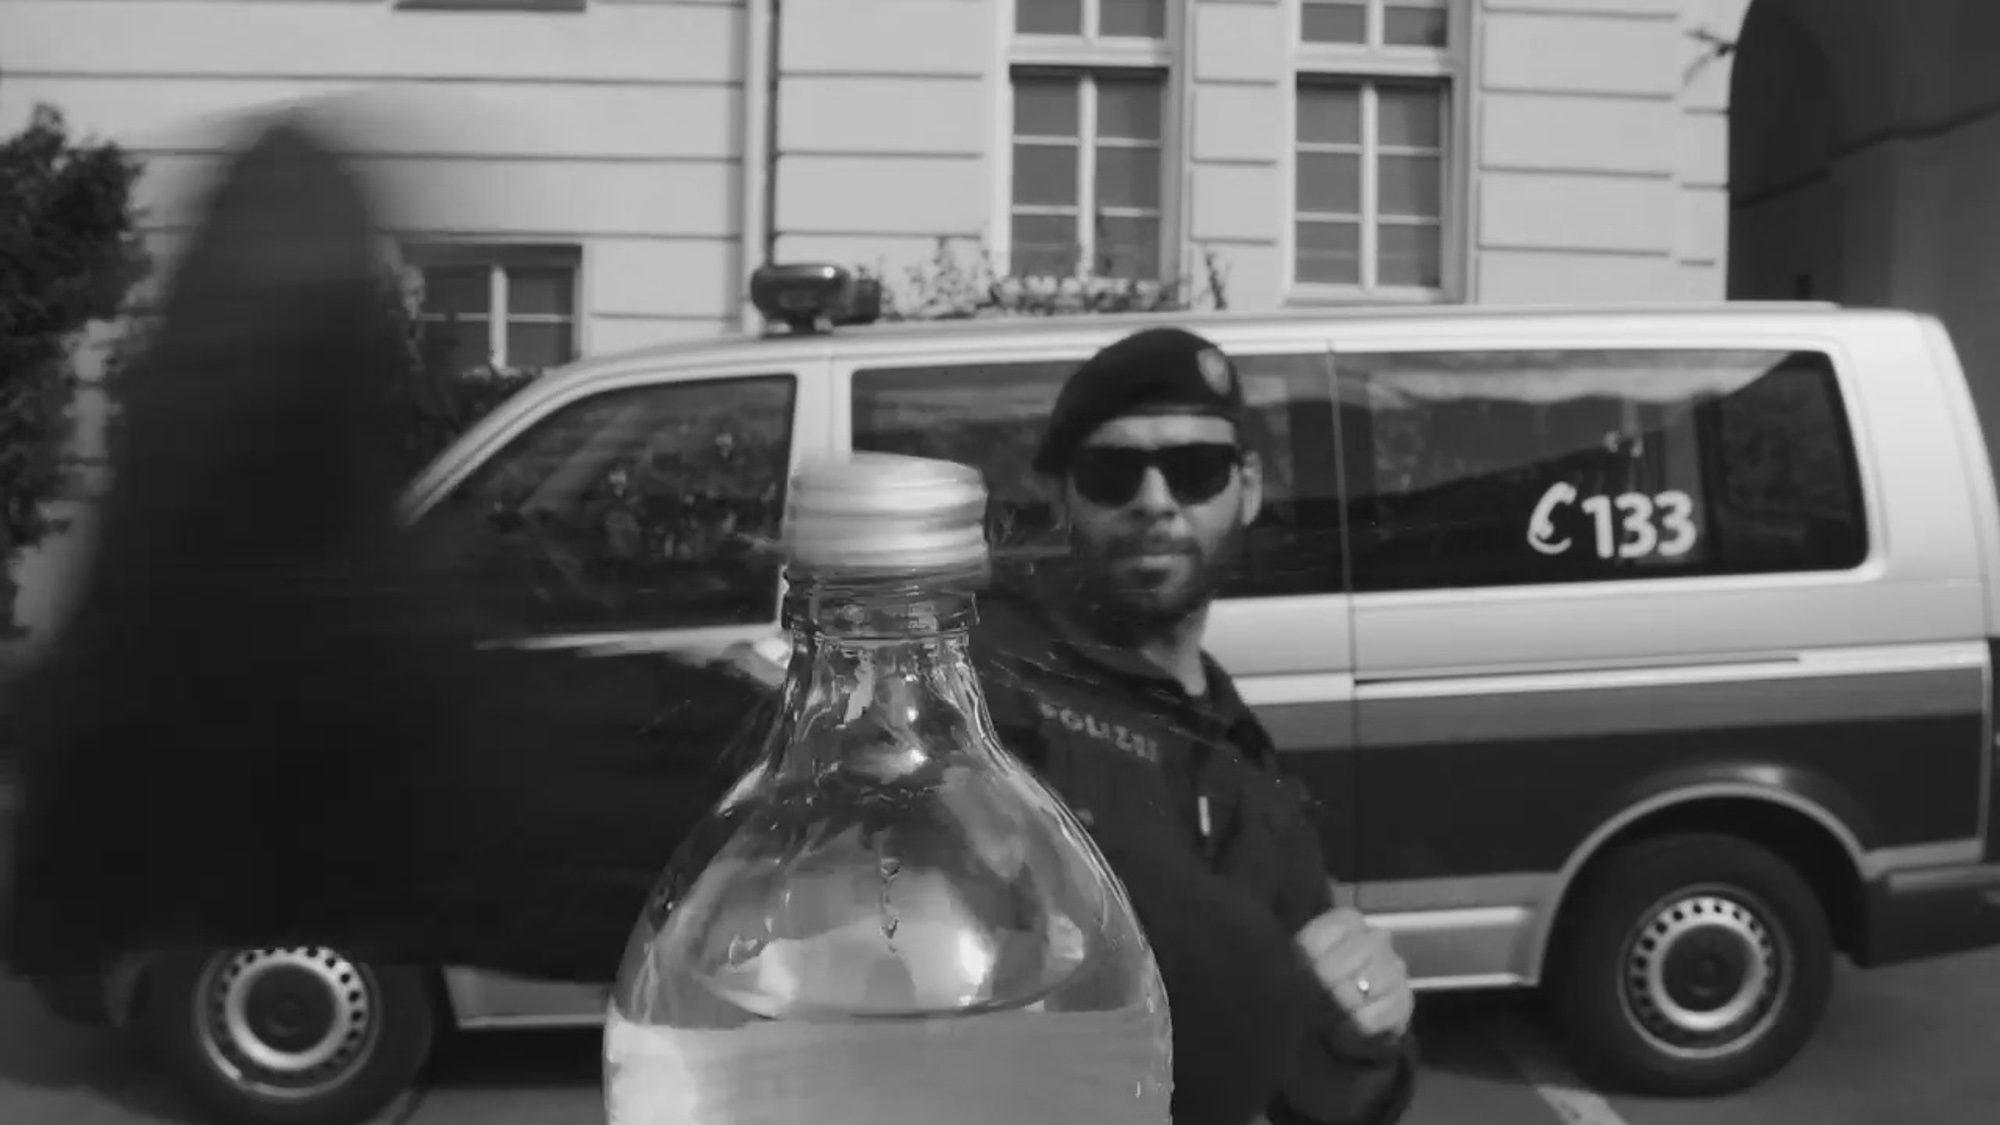 Bottle Cap Challenge Cop Says Brit Actor Inspired Him